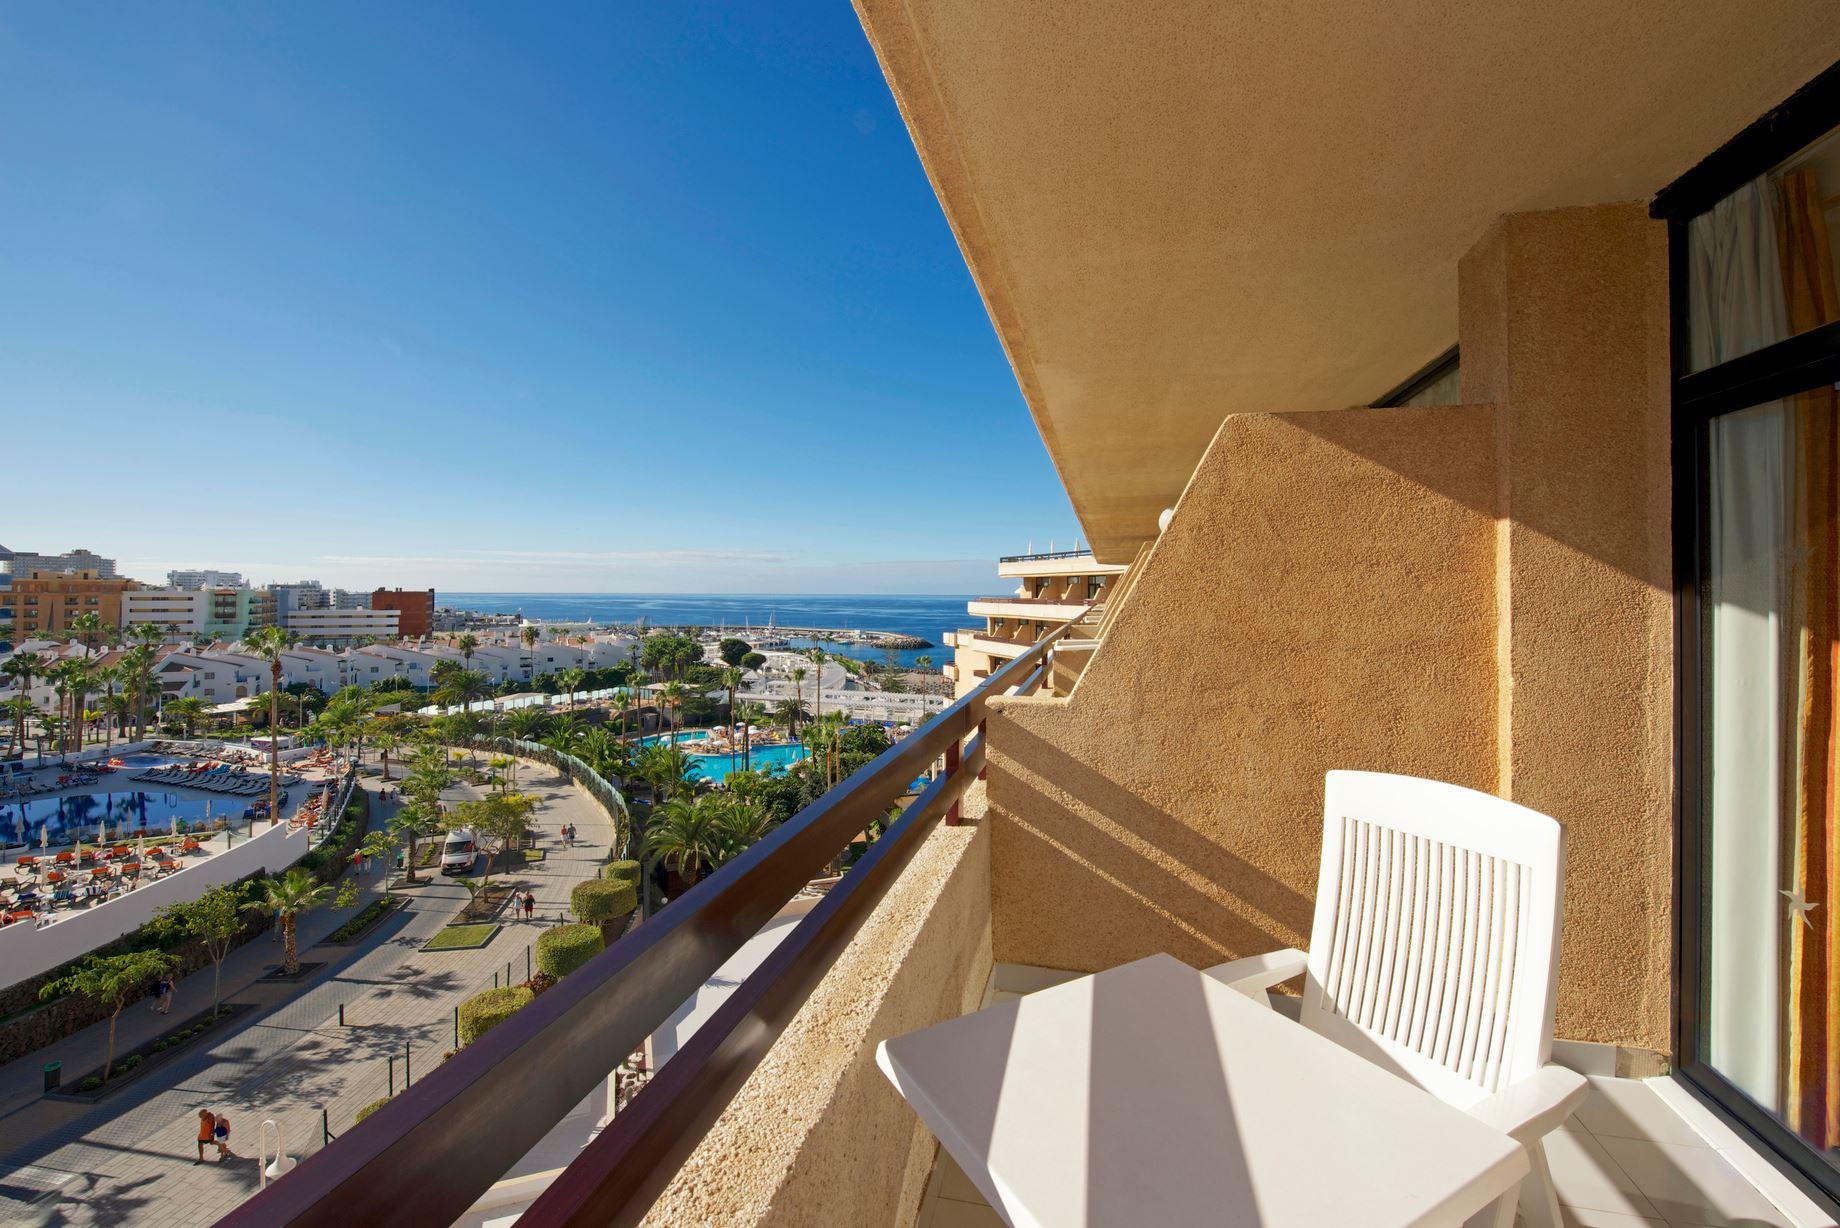 Utsikt från rum, Iberostar Torviscas Playa, Adeje, Teneriffa, Signaturresor